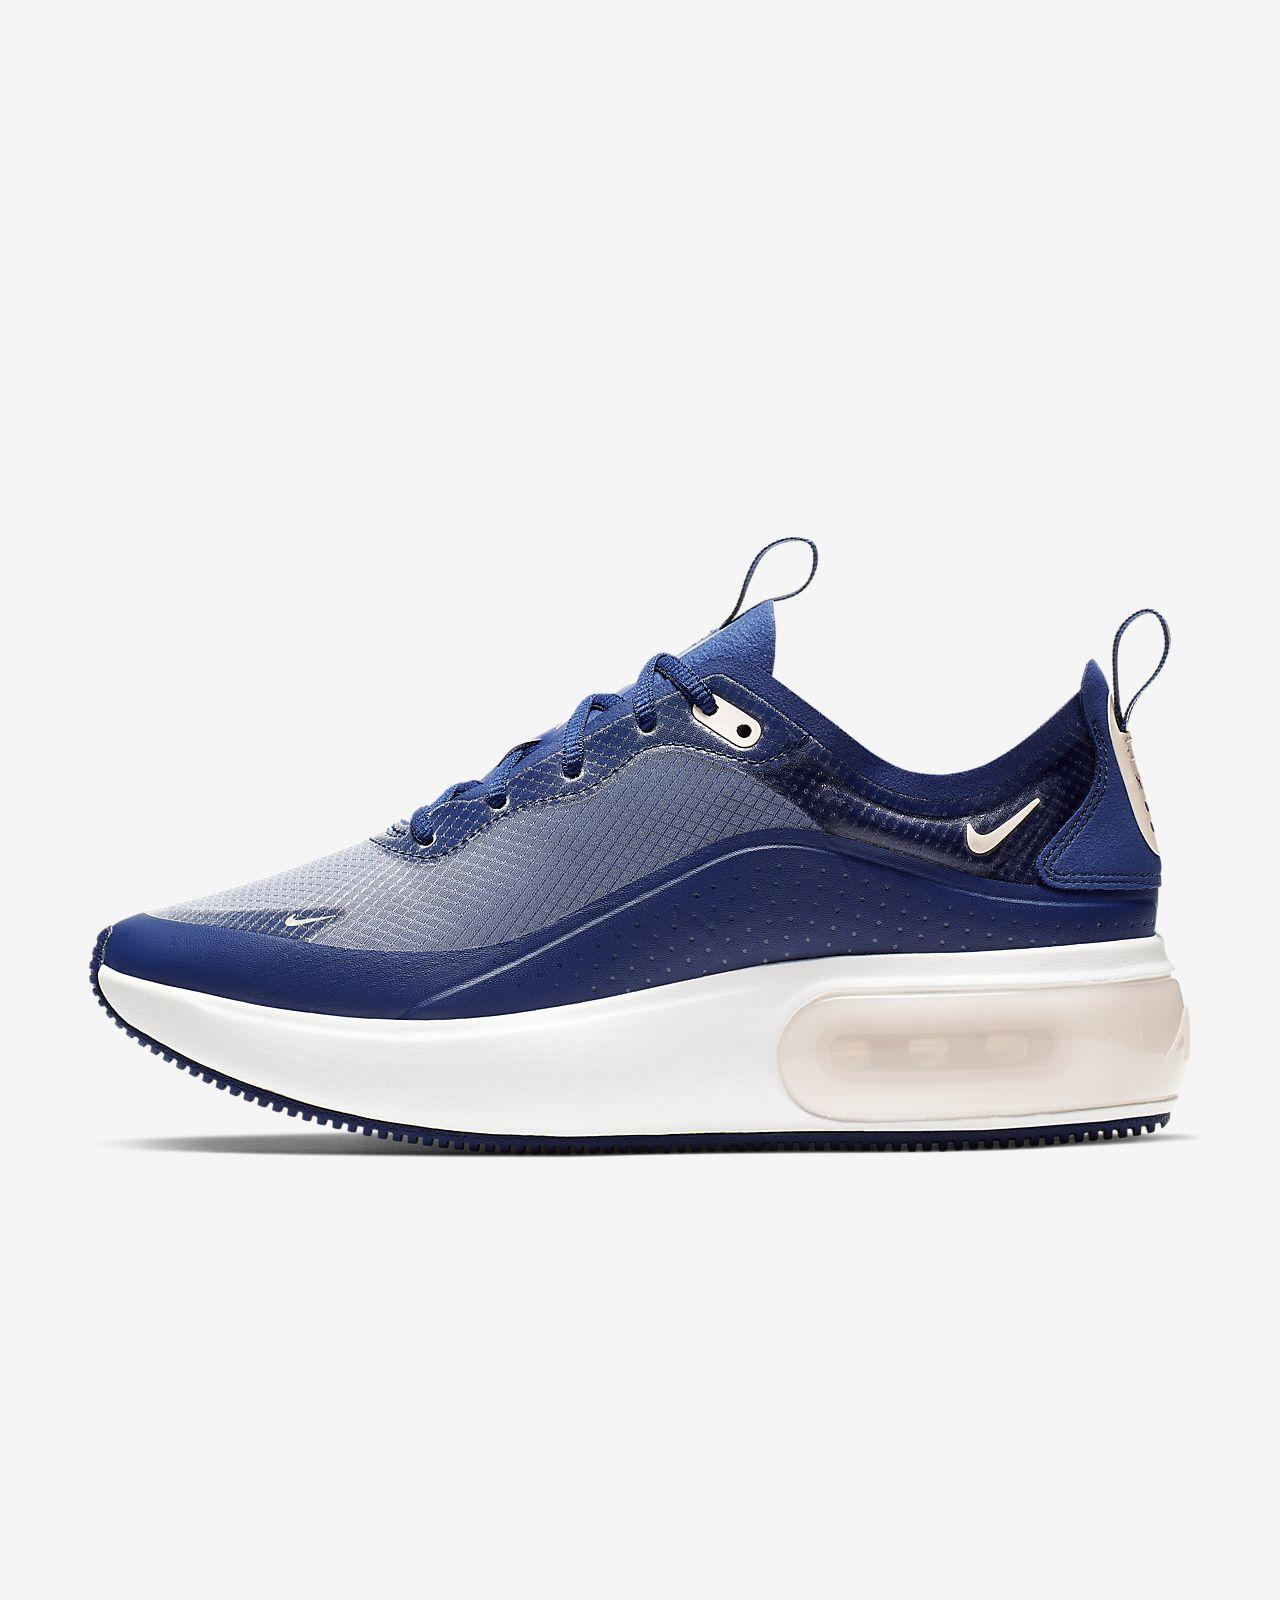 Nike Air Max Dia SE女子运动鞋